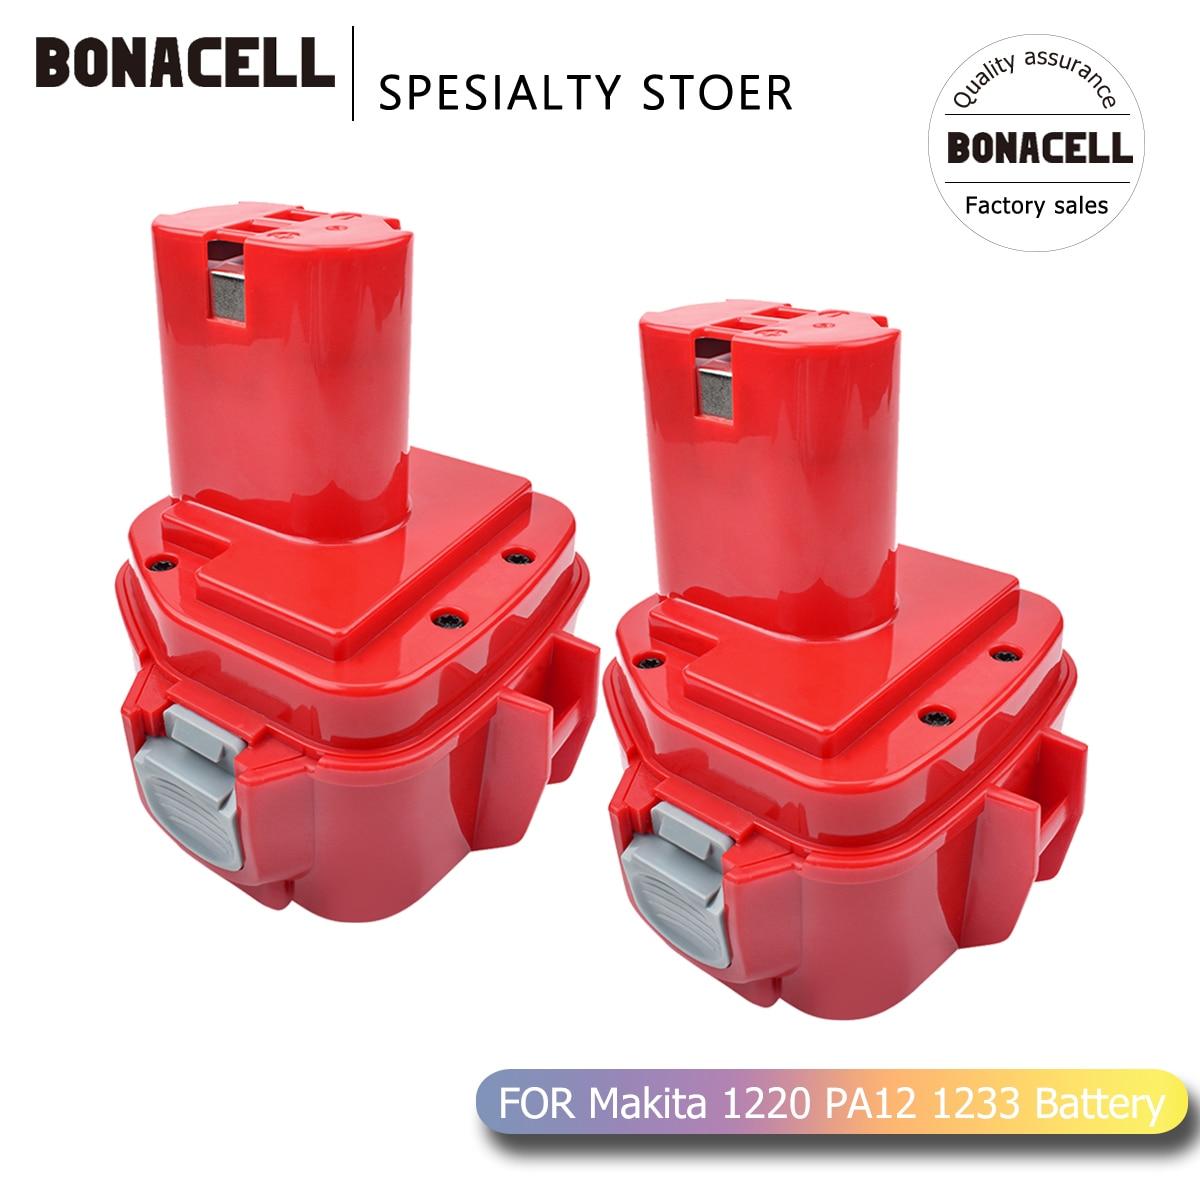 Bonacell 12v 4000mAh متولى حسن استبدال بطارية لماتيكا 1220 PA12 1222 1233S 1233SA 1233SB 1235 1235A 1235B 192598-2 L30